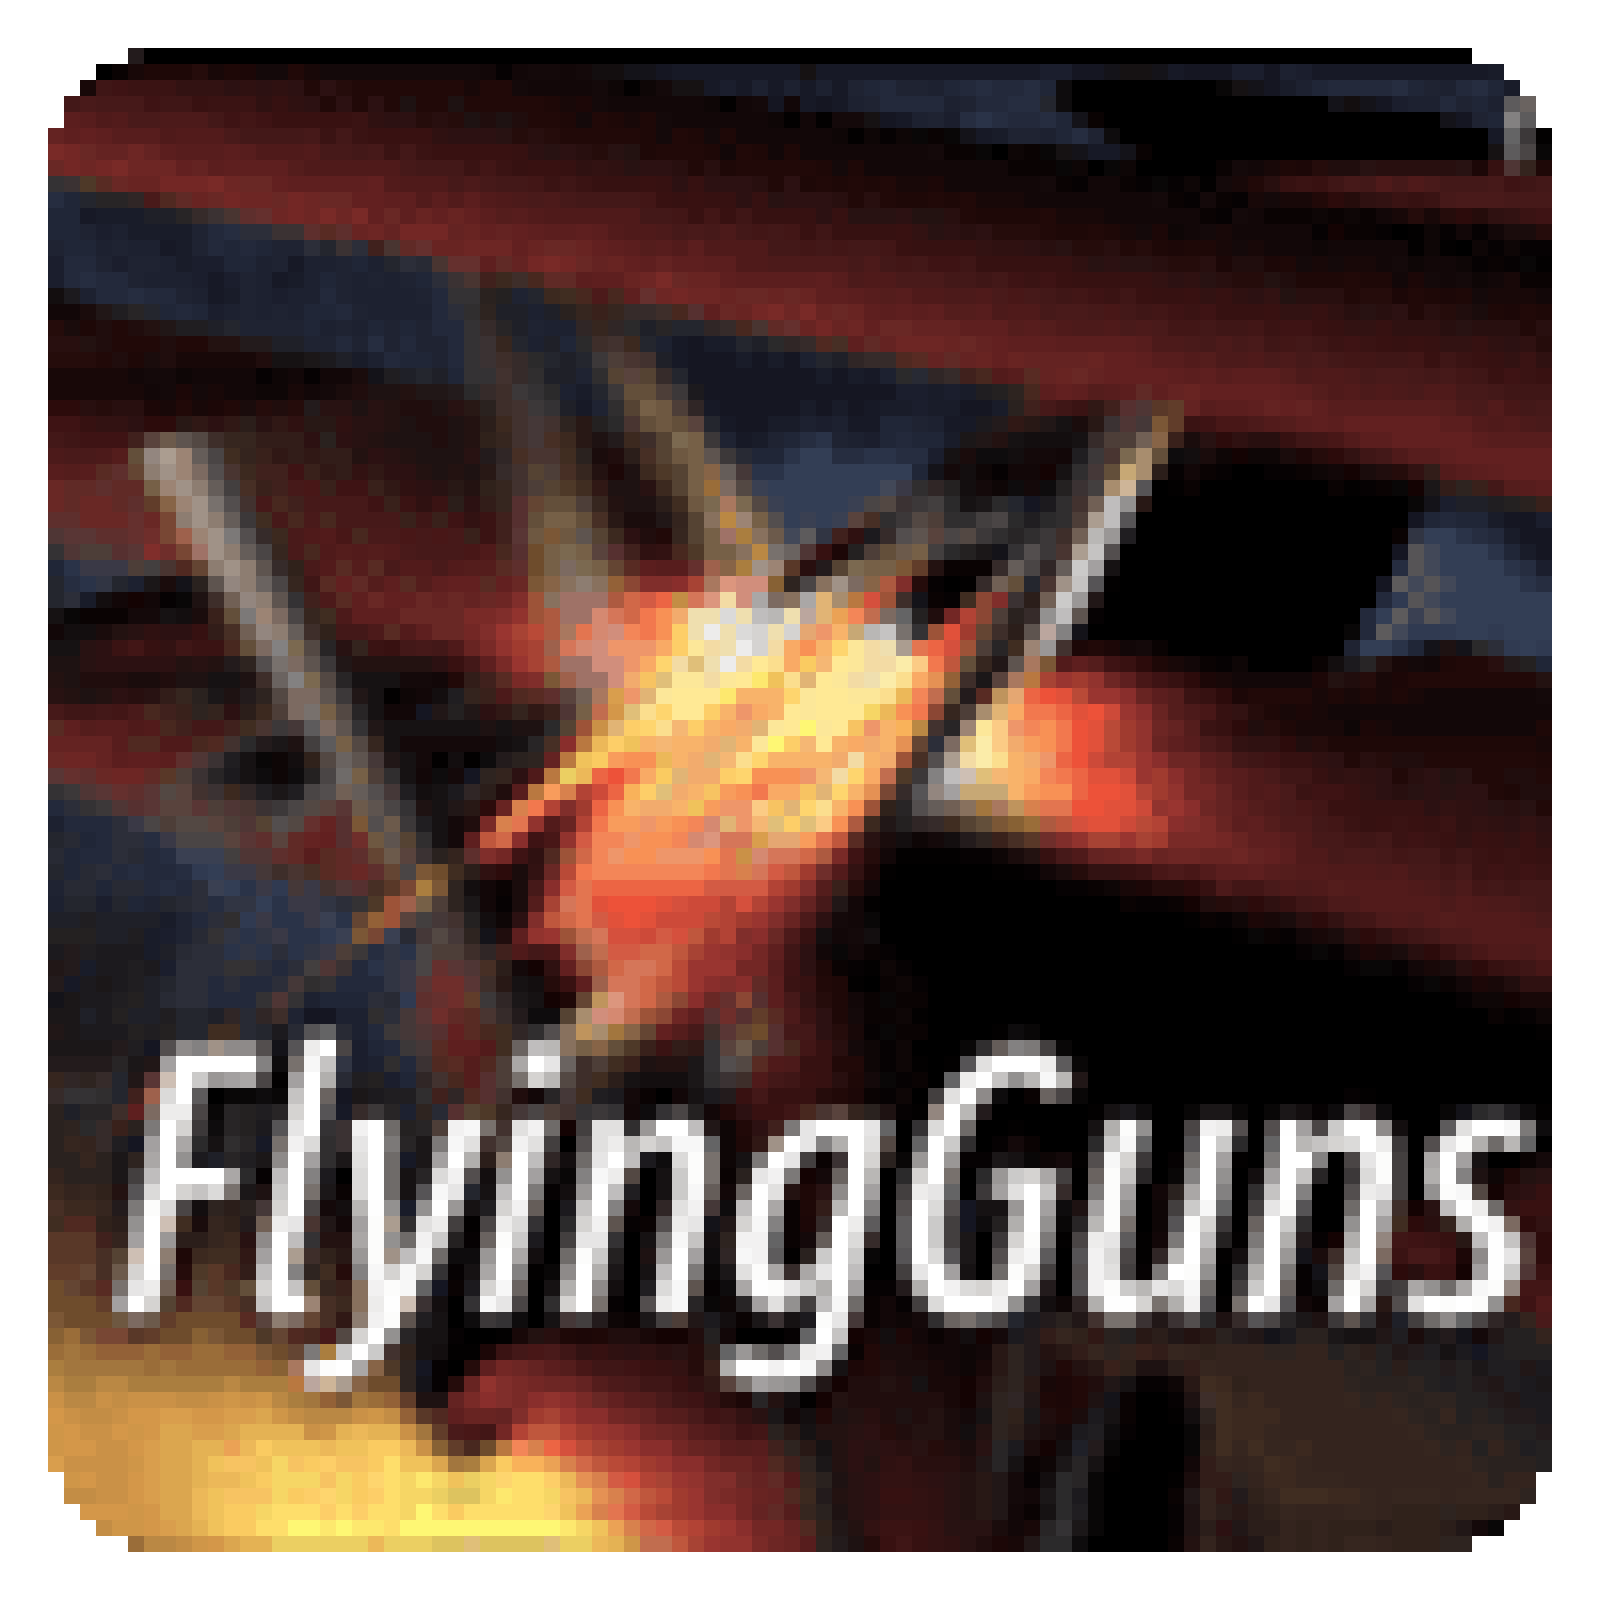 FlyingGuns